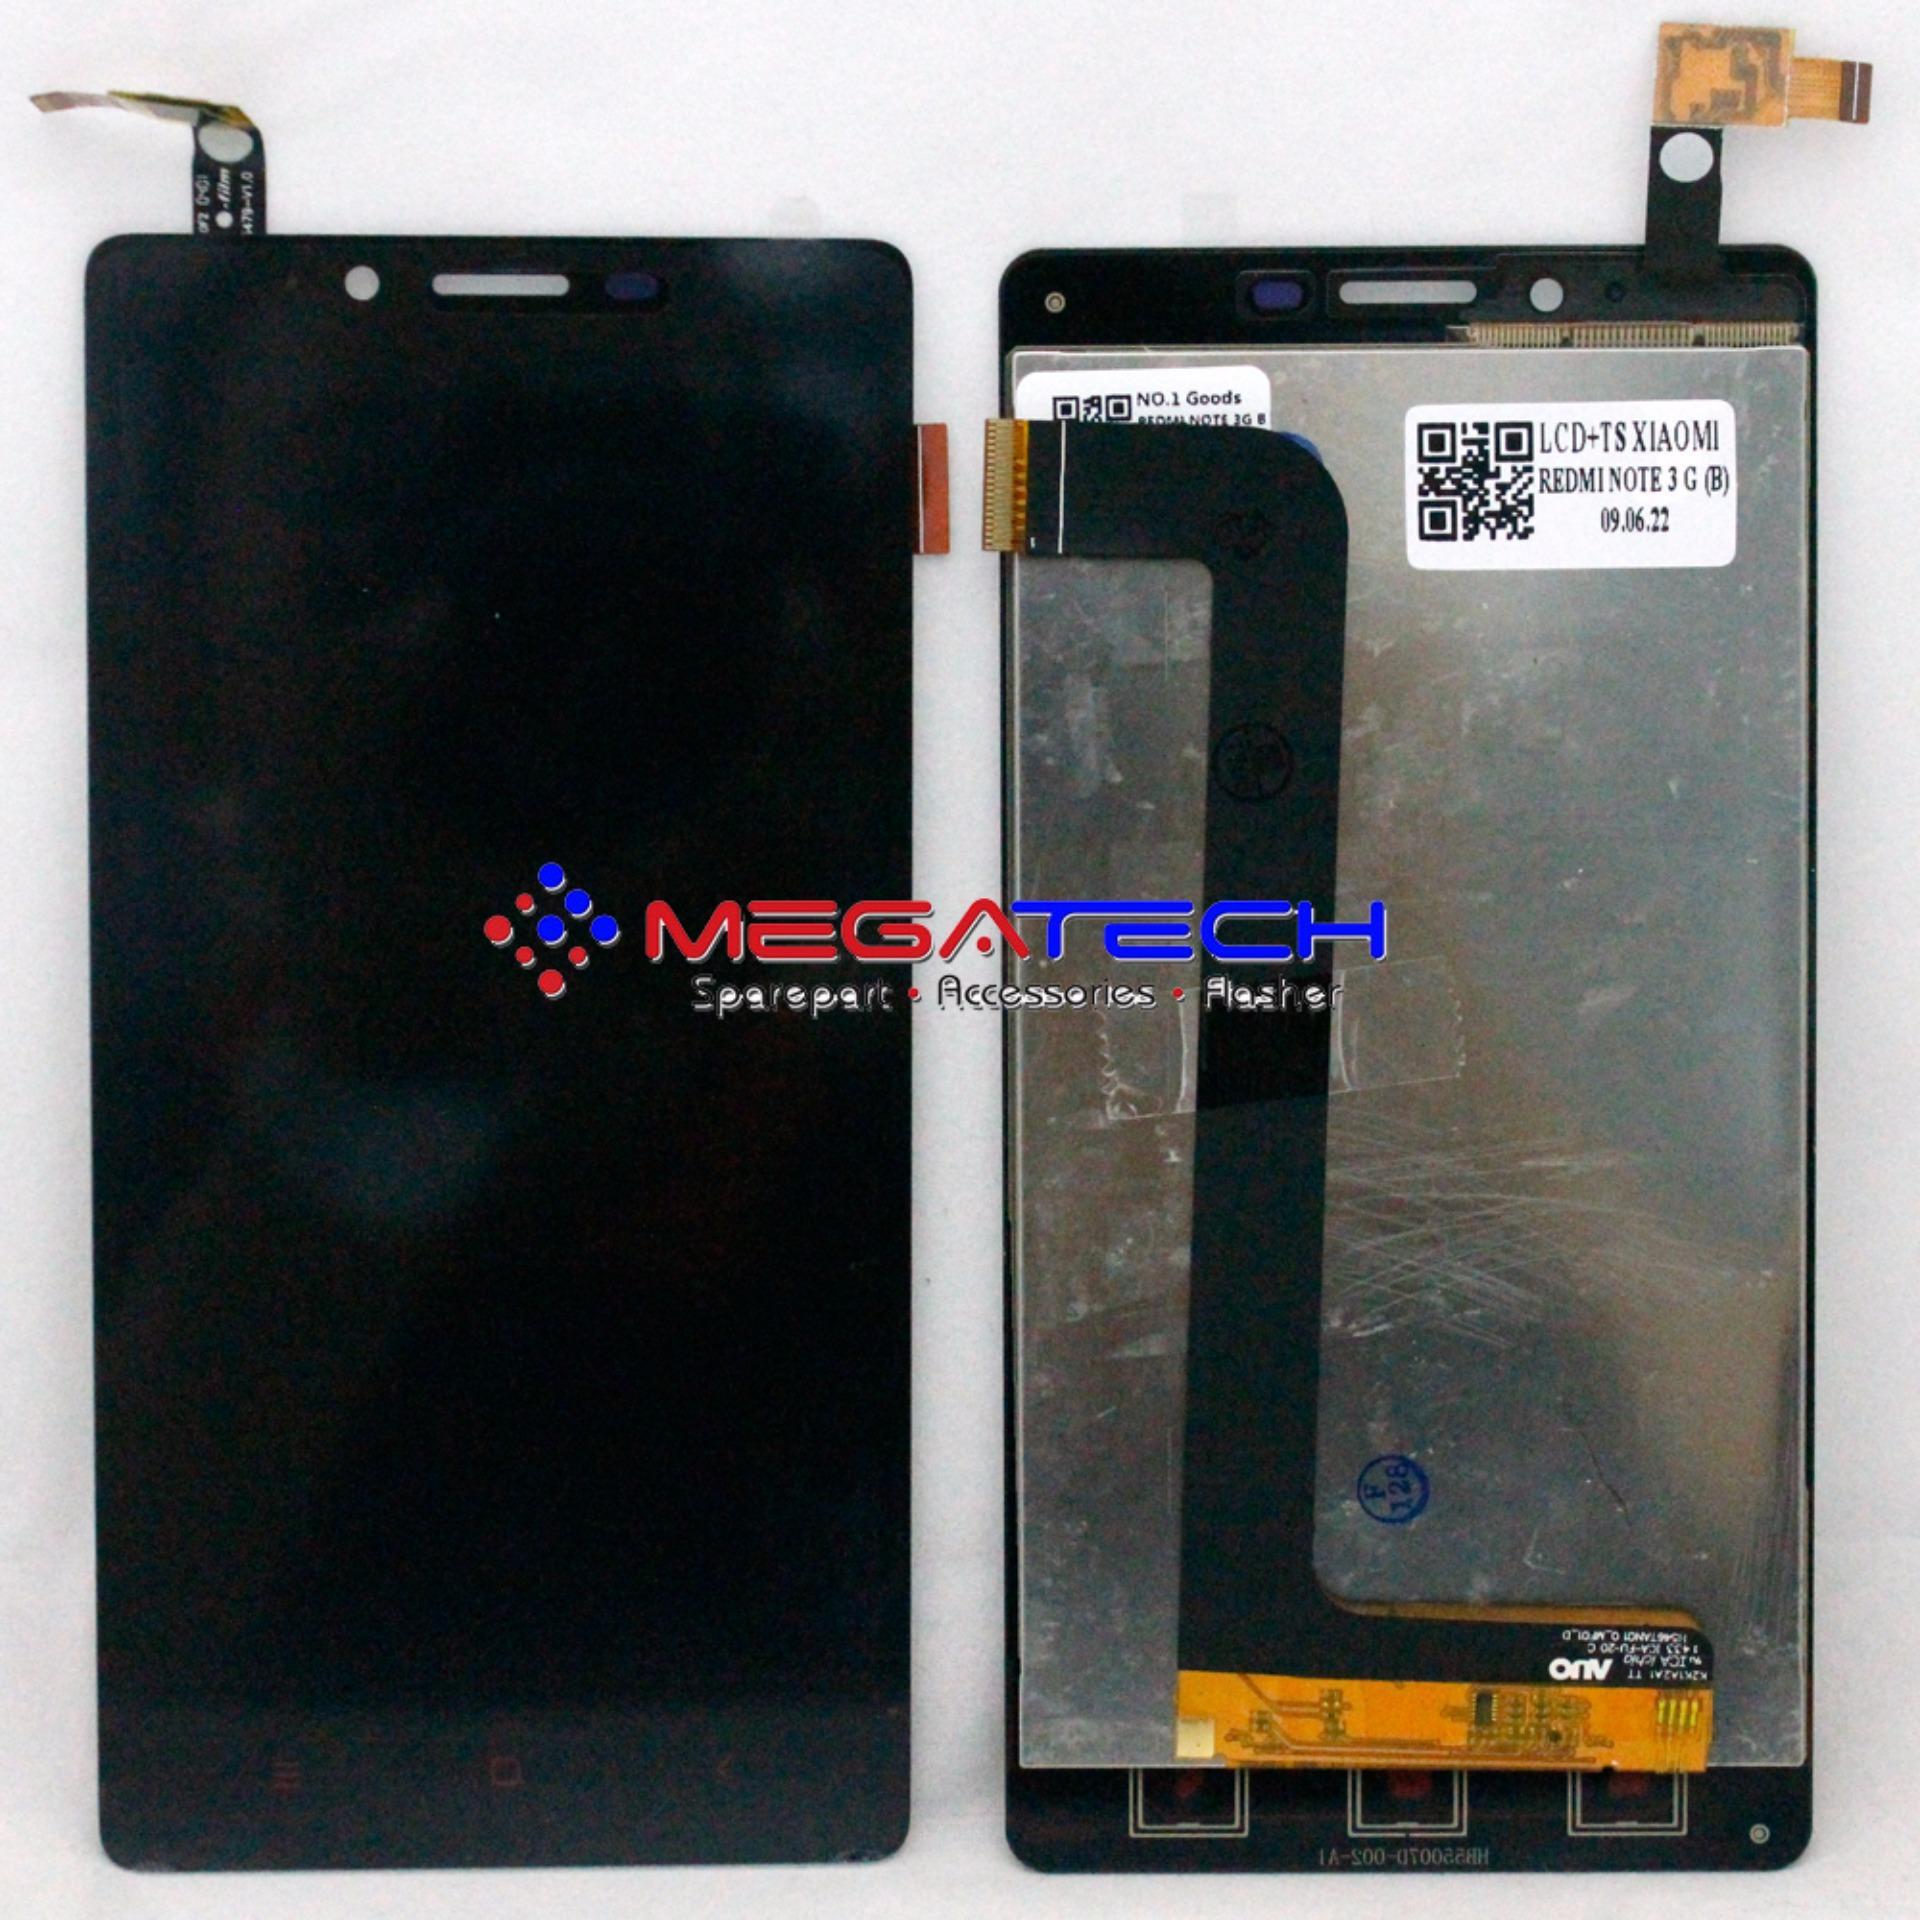 Pelacakan Harga Lcd Touchscreen Xiaomi Redmi Note 3g Black Baru Flash Sale